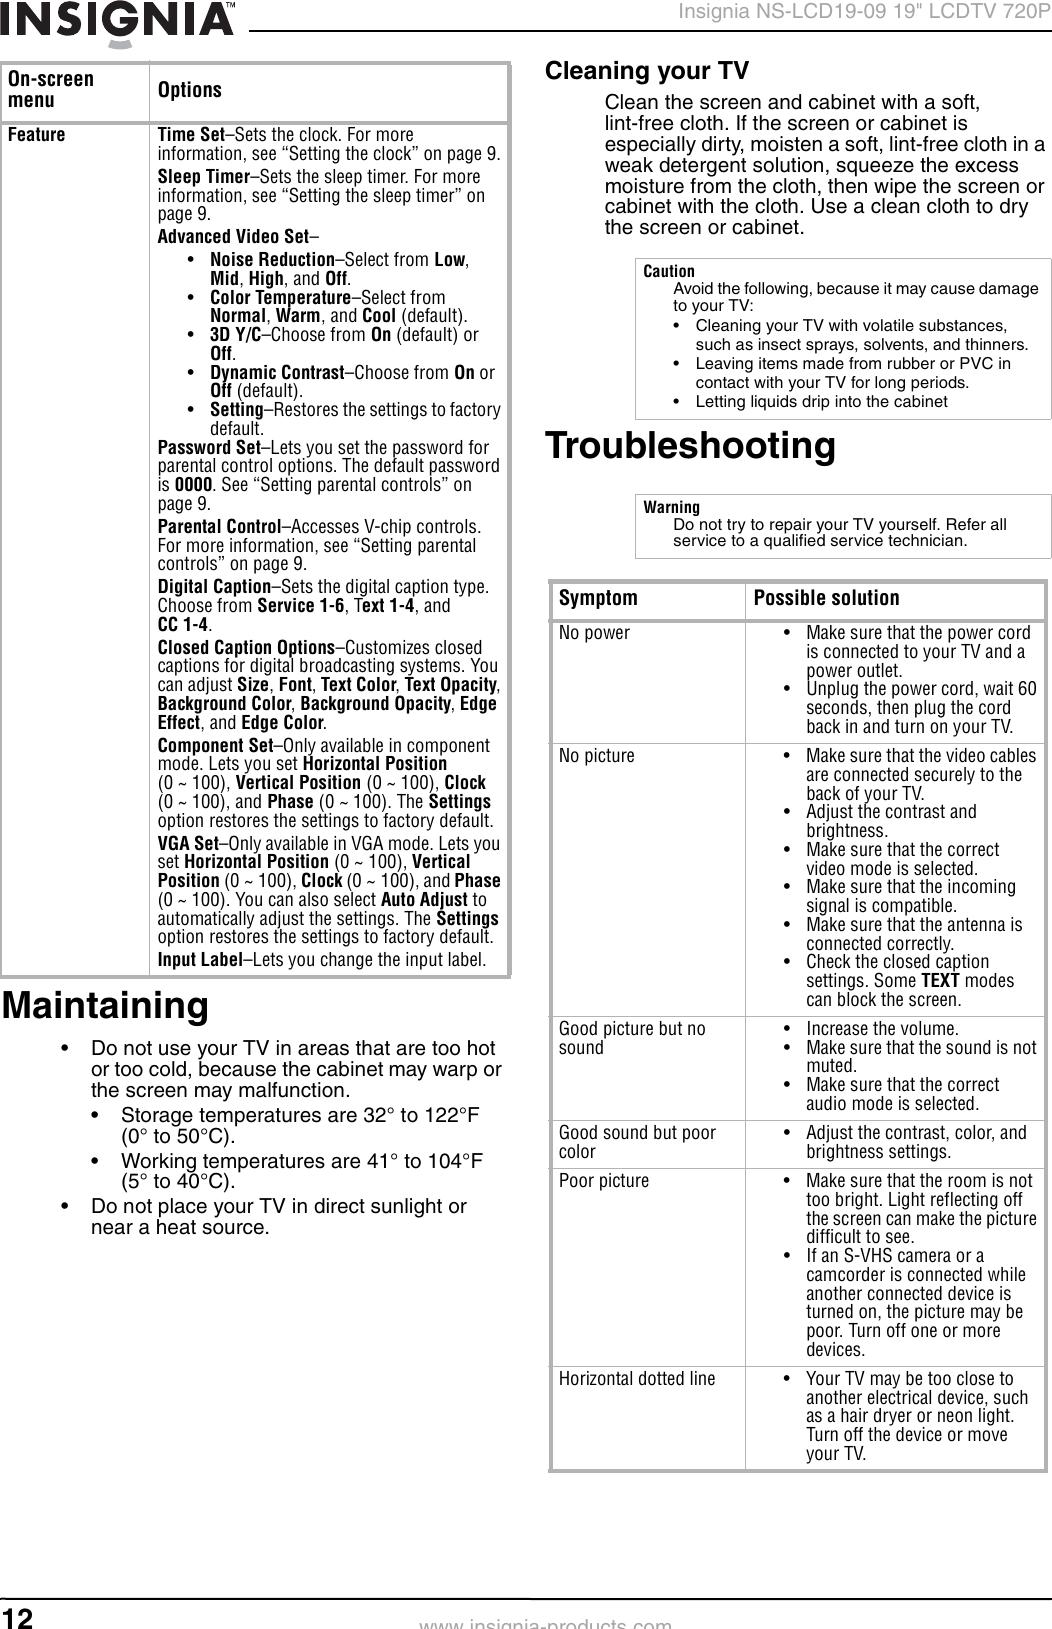 Insignia NS LCD19 09 User Manual To The C439dee2 f730 4e6e